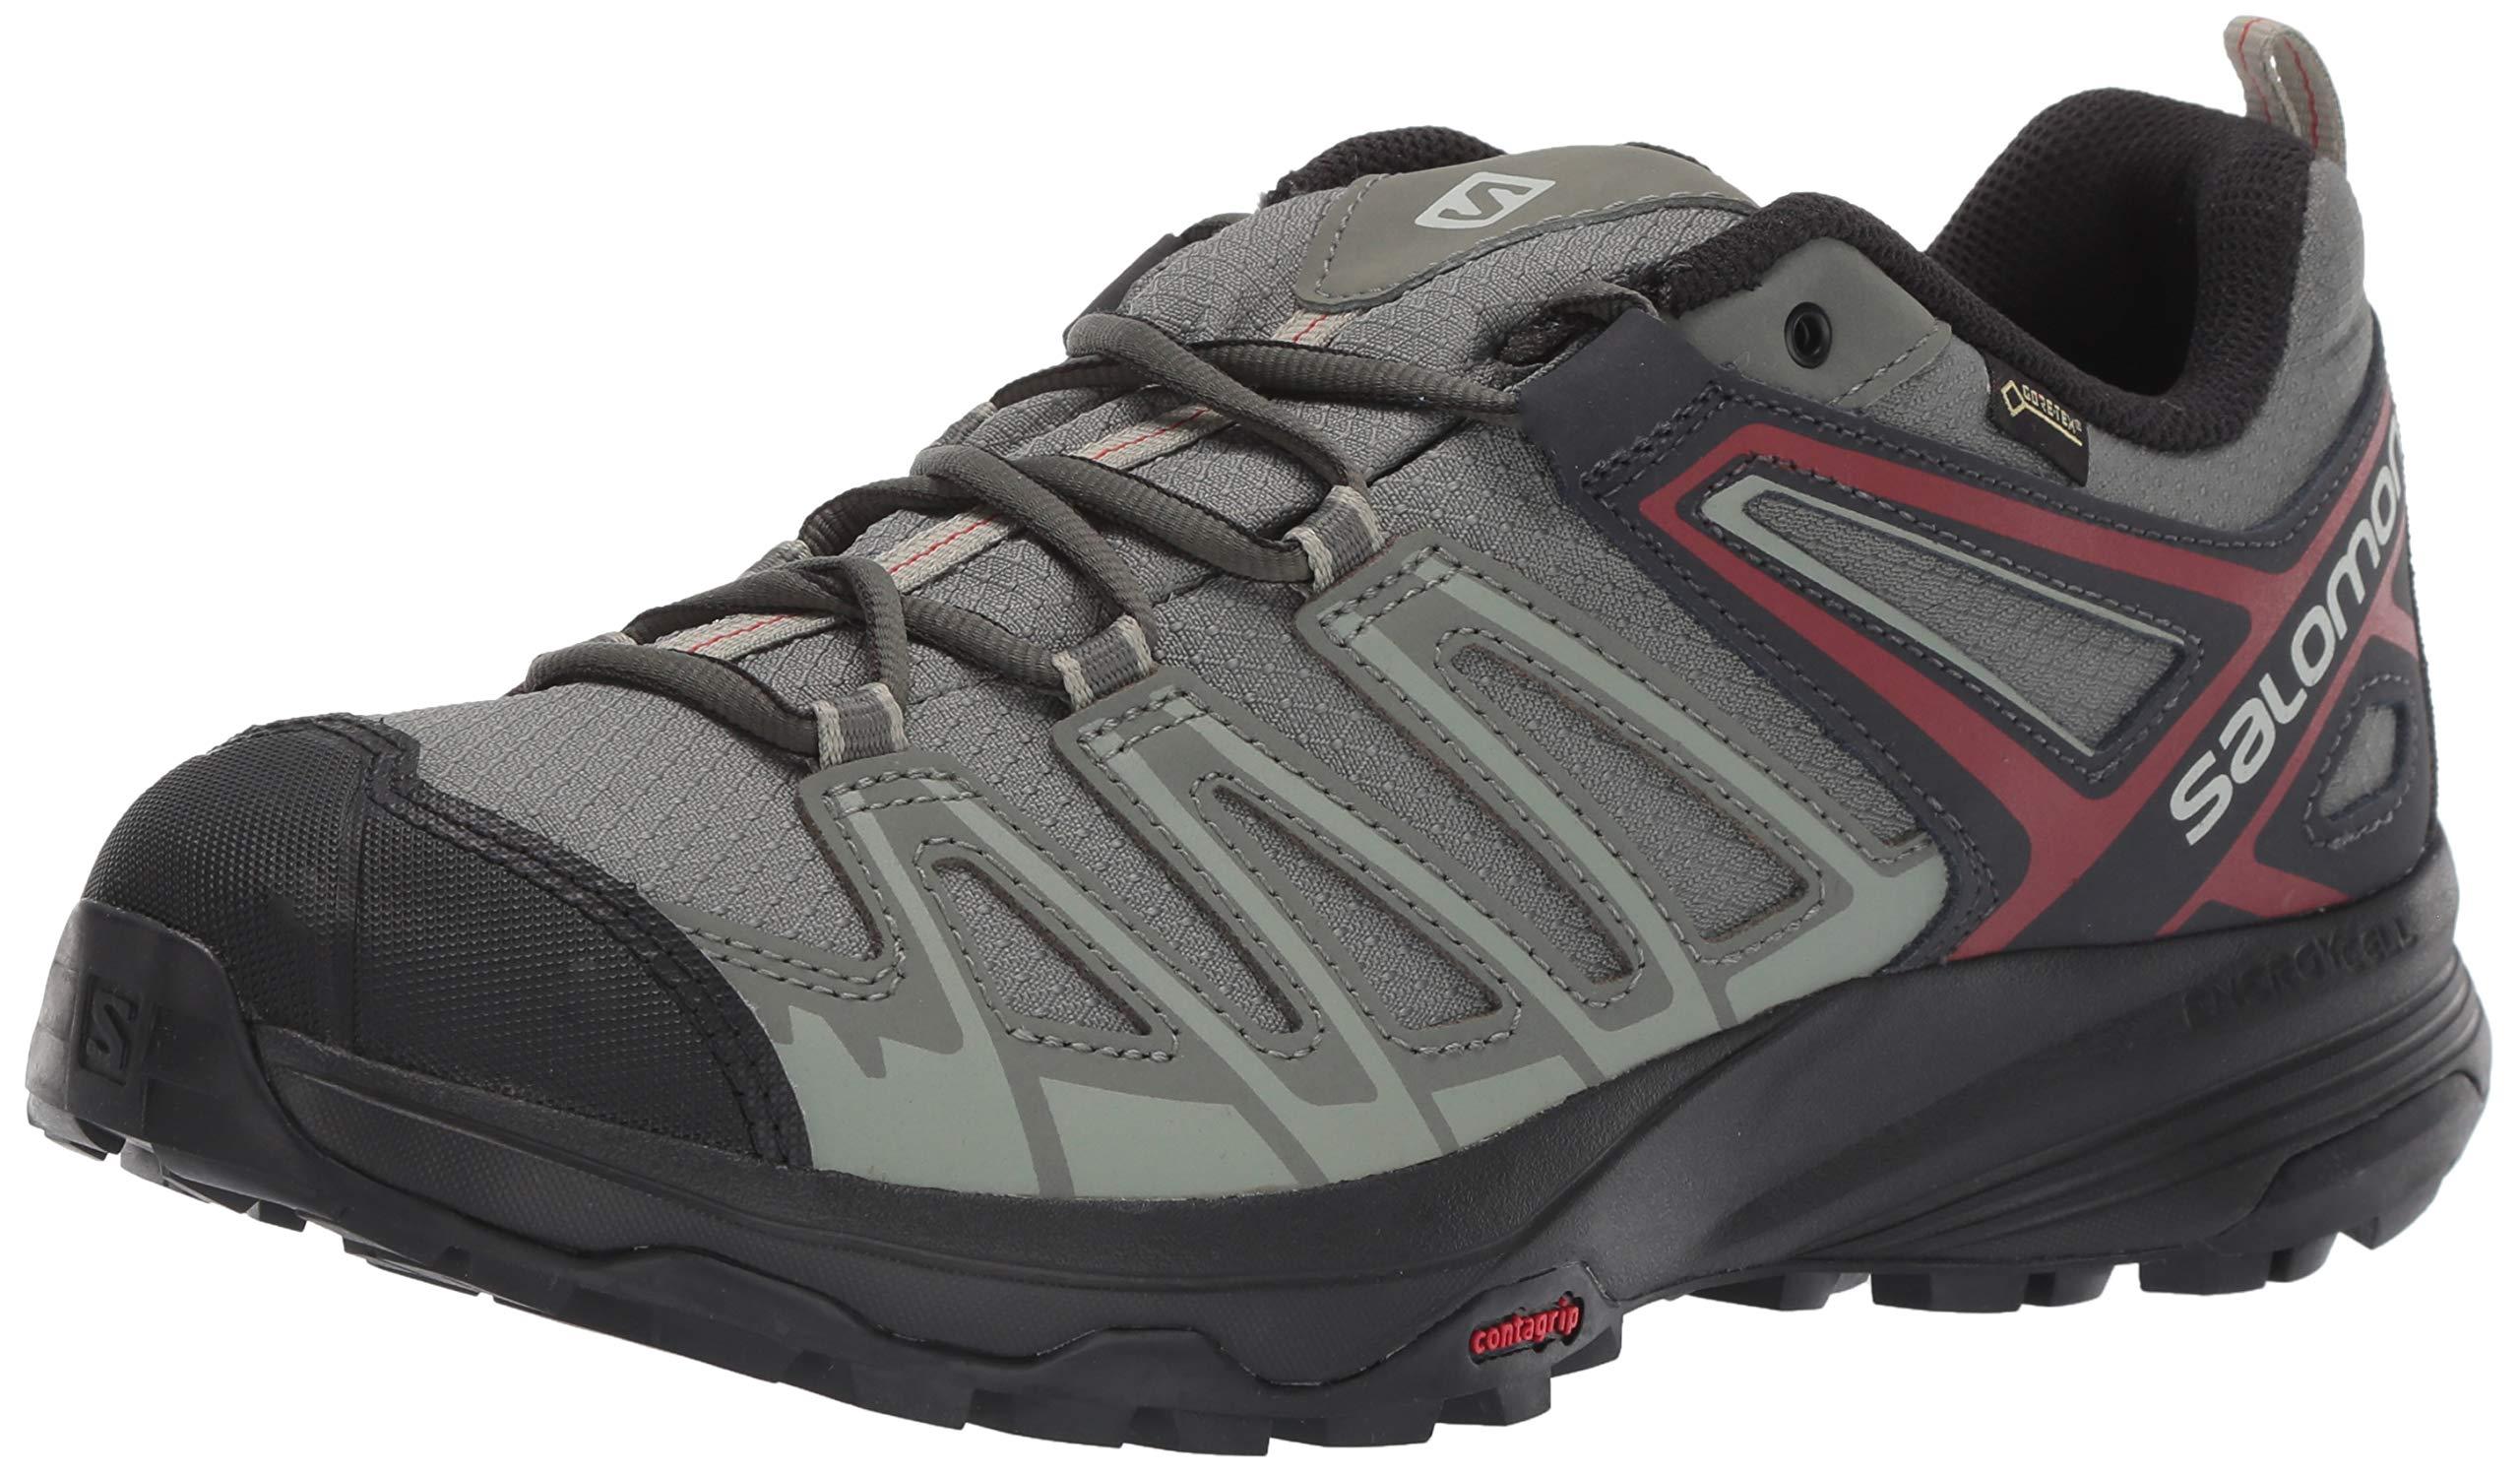 SALOMON Men's X Crest GTX Hiking Shoes, Castor Gray/Shadow/Bossa Nova, 7 by SALOMON